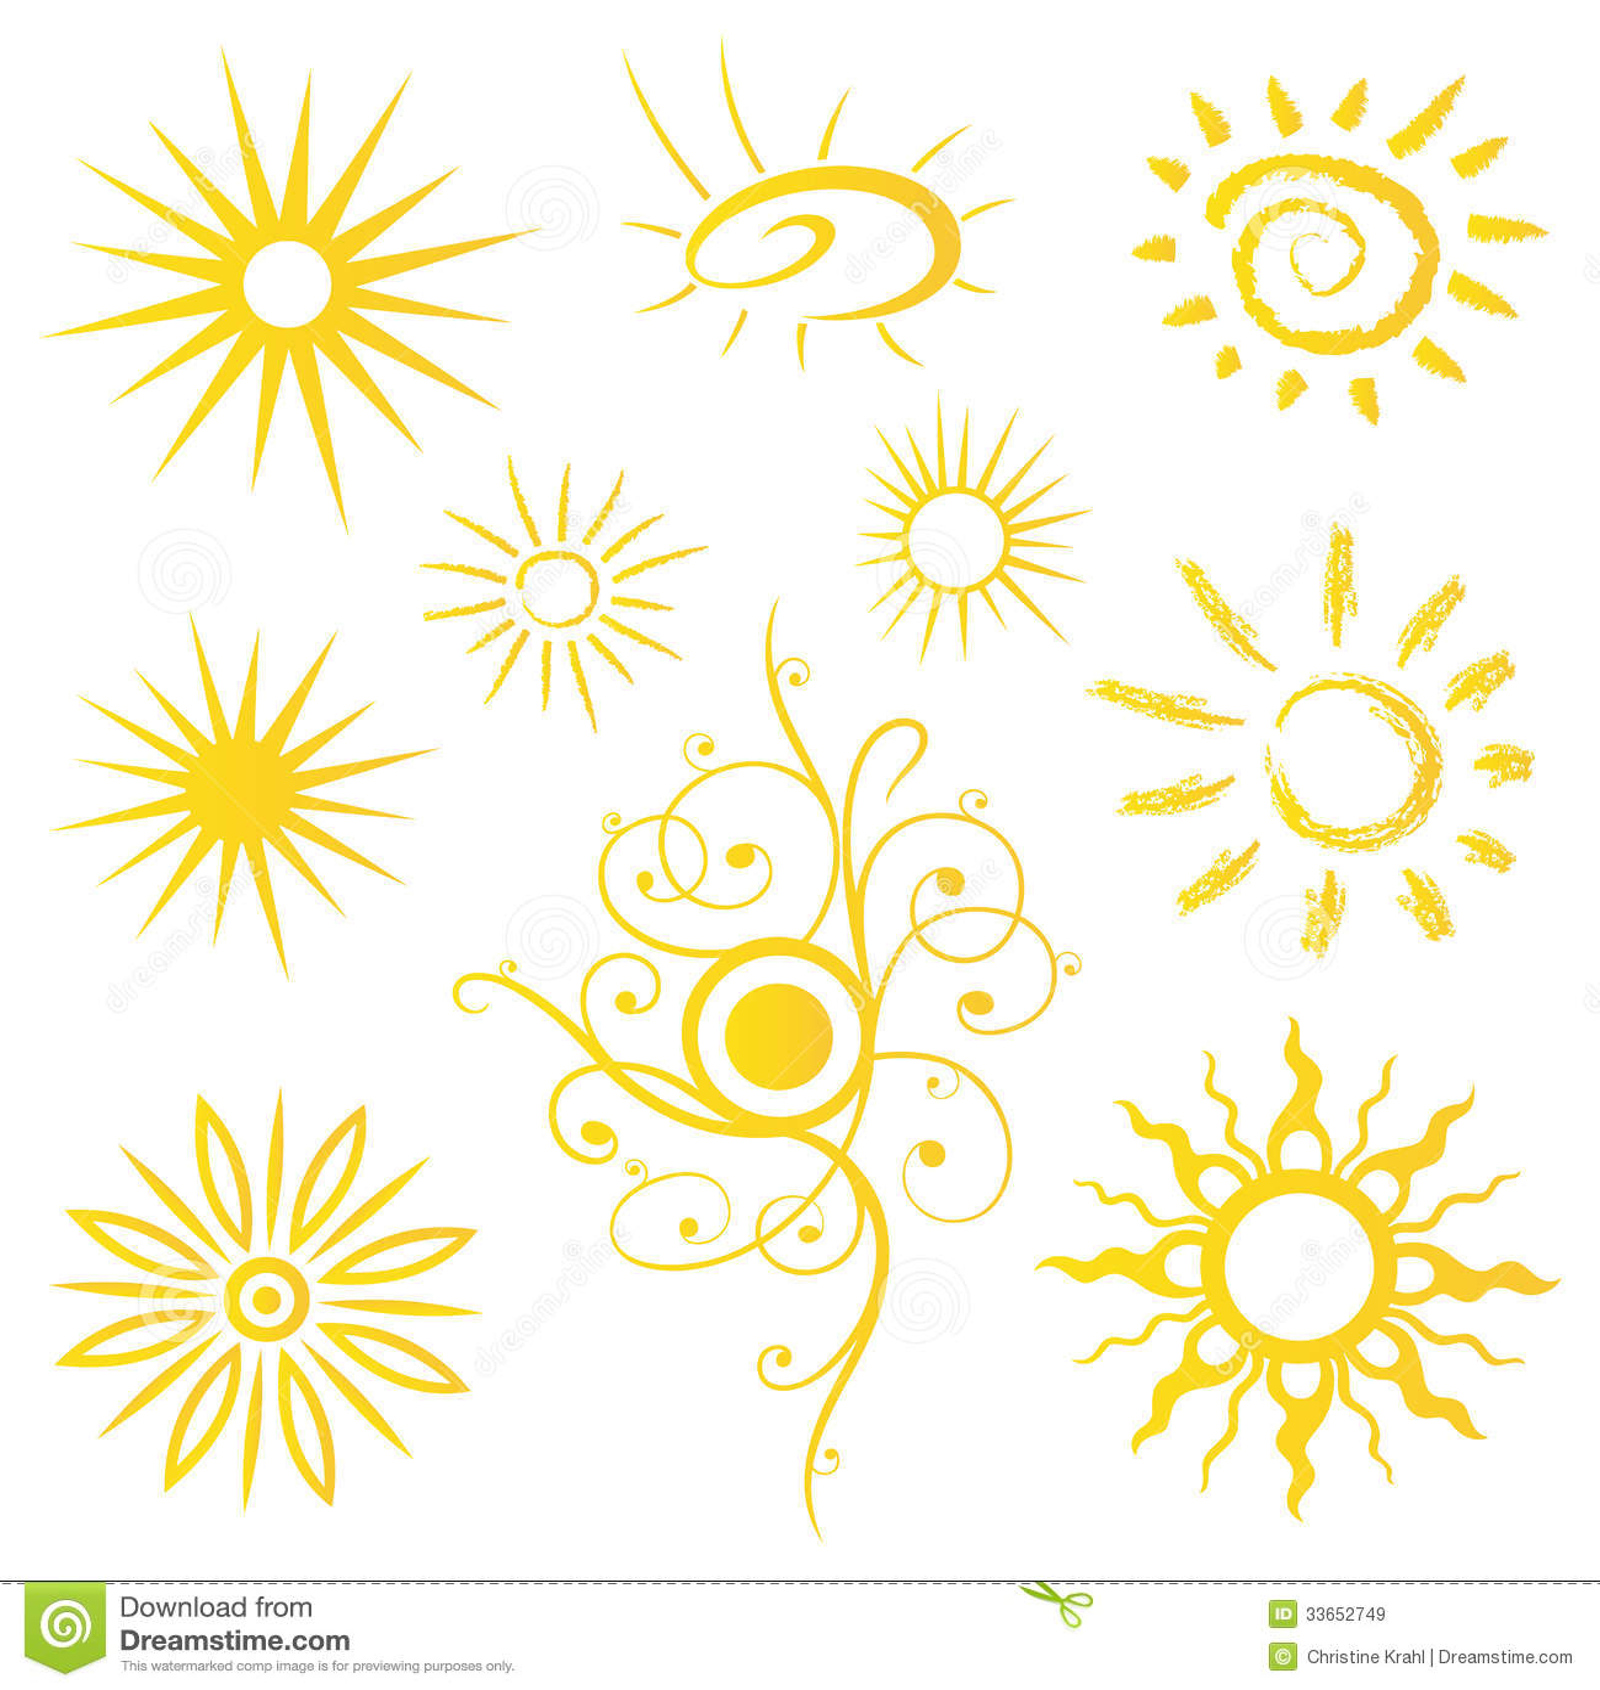 Zon, zonneschijn, de zomer